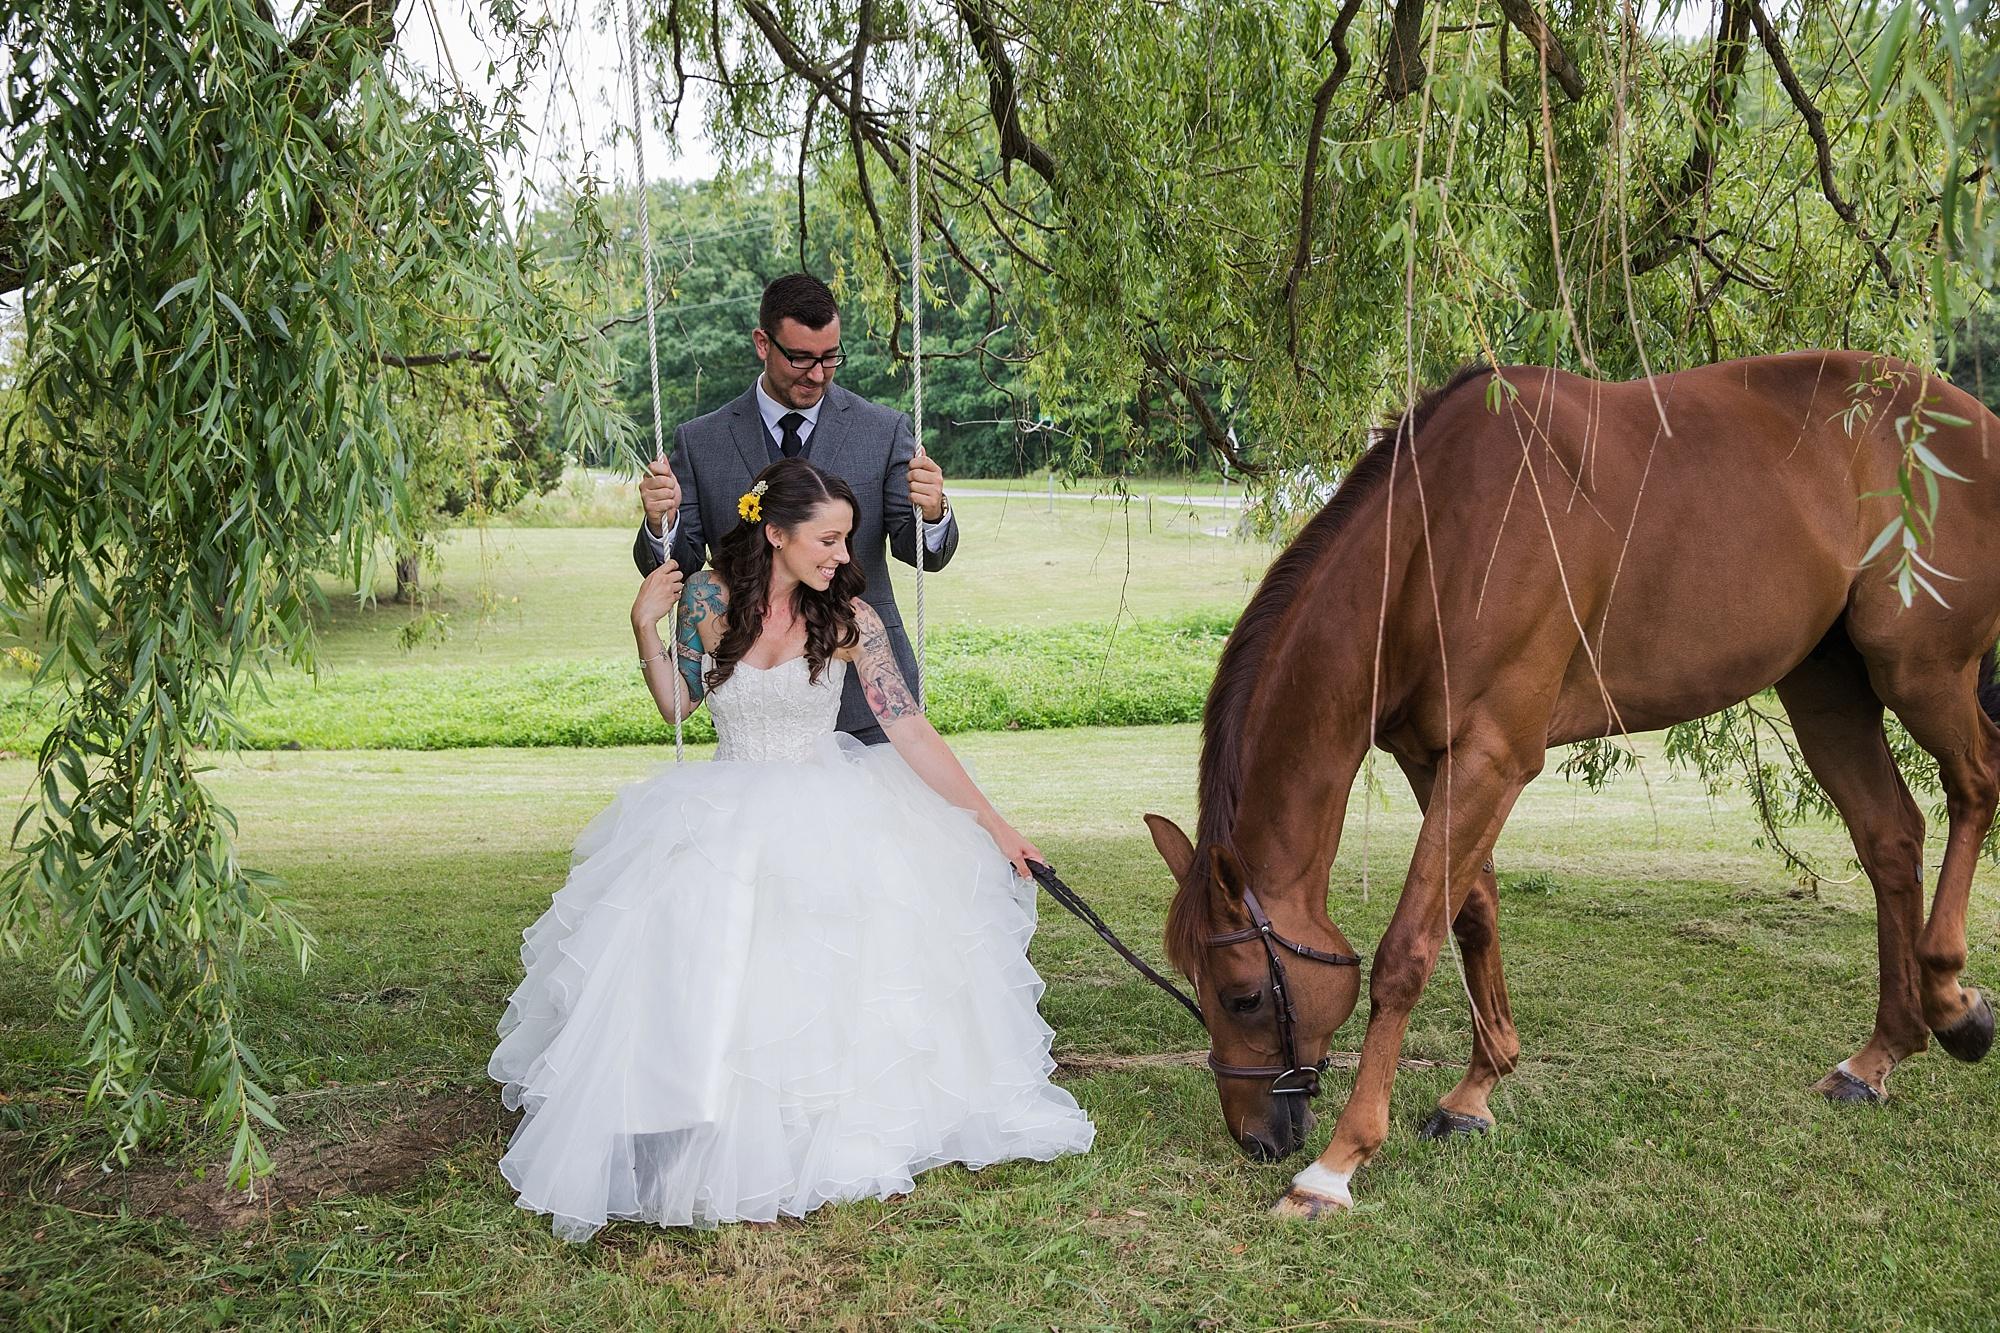 lipapark-hernderwinery-wedding_0054.jpg